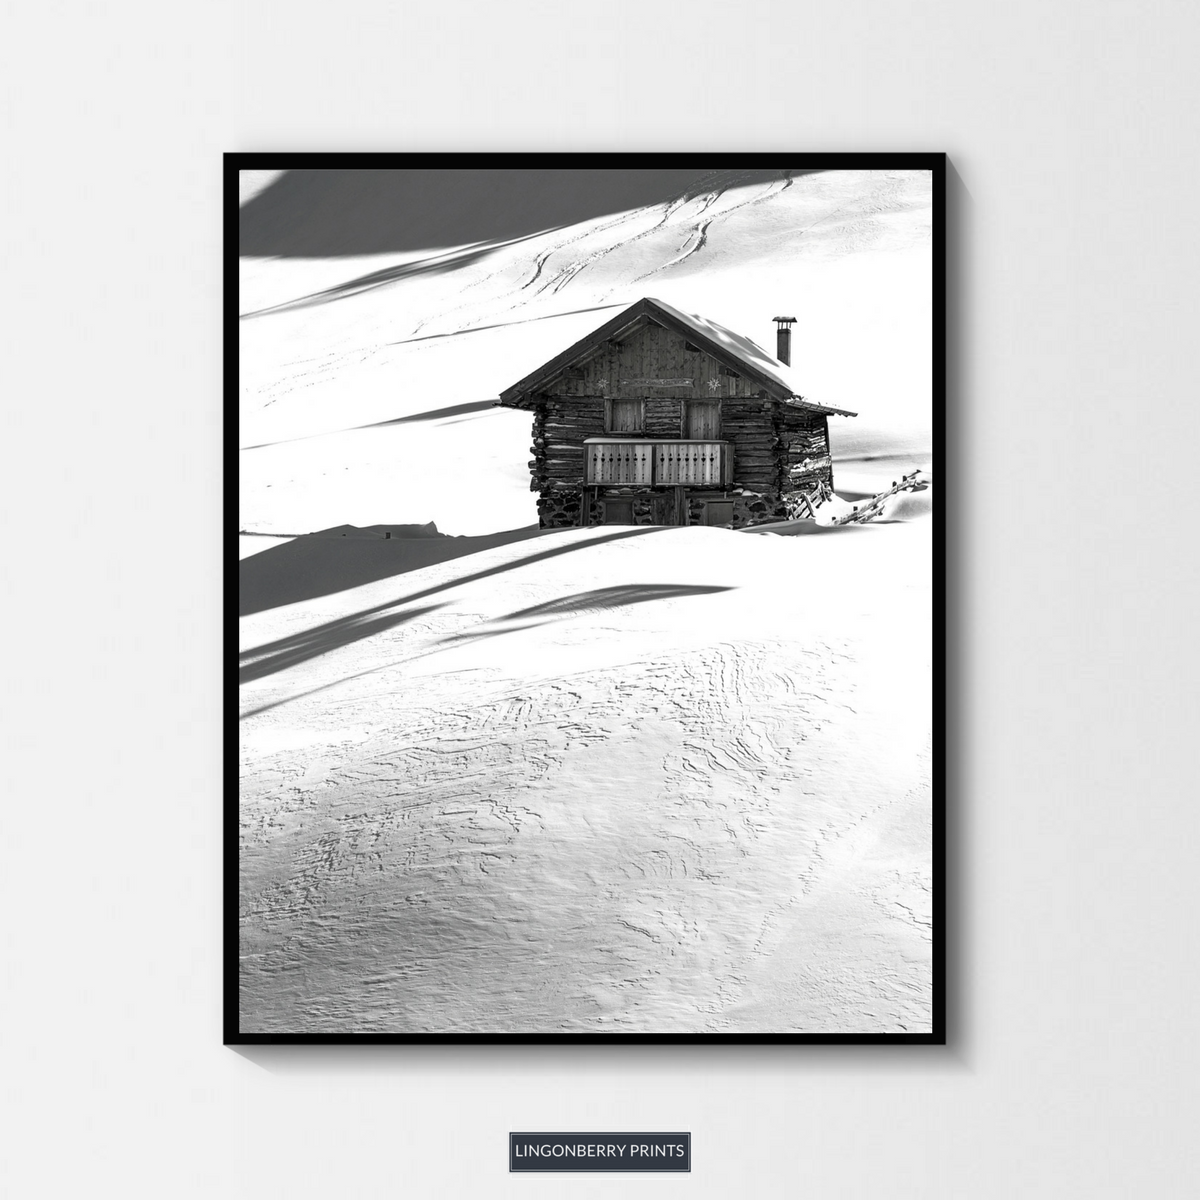 Printable Download Nordic Cabin Wall Art Mokki Ski Lodge Snow Mountain Scandinavian Minimal Black Cabin Wall Art Nordic Lodge Scandinavian Minimalism